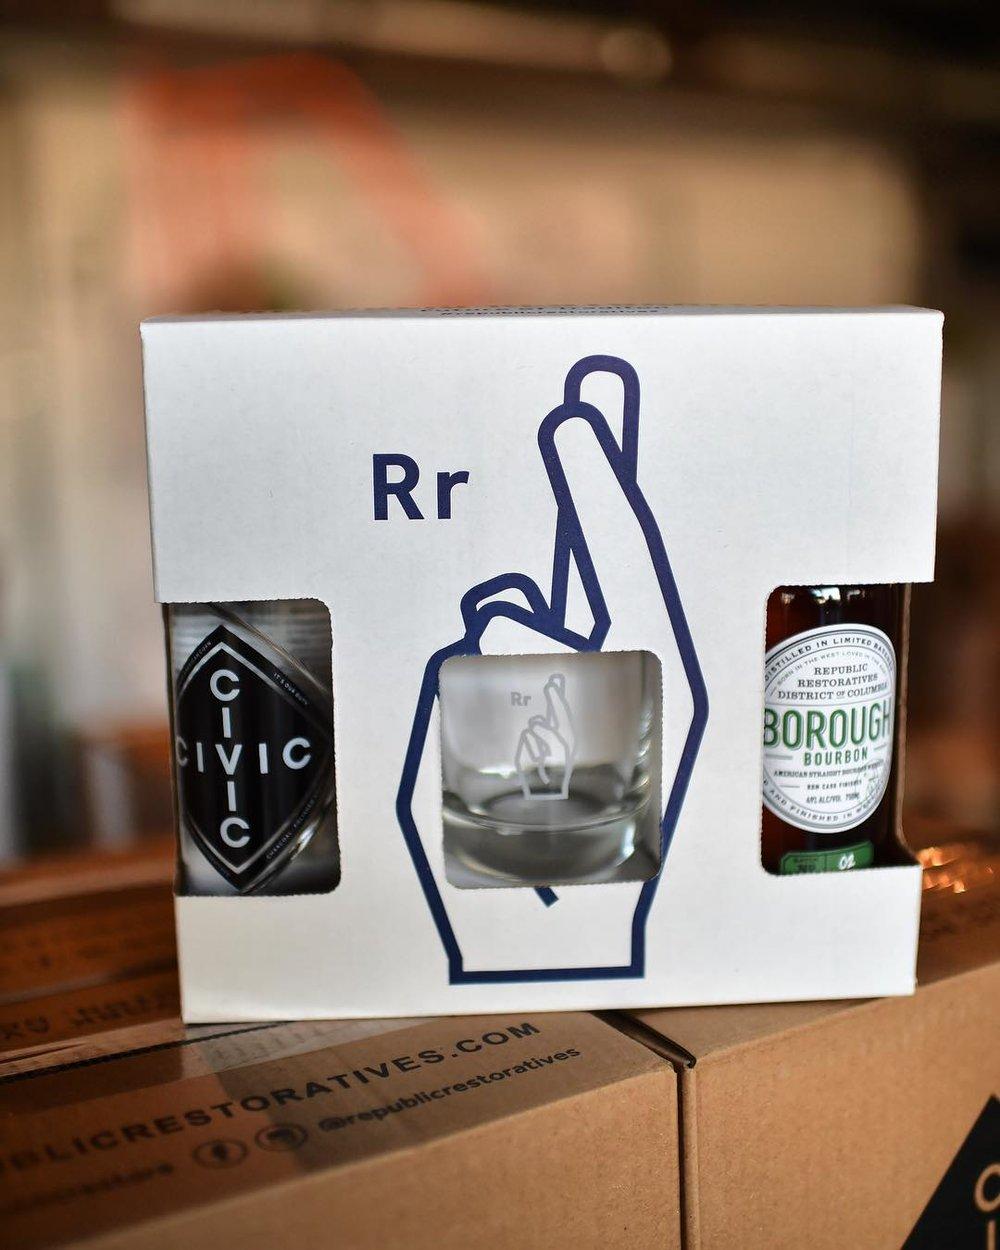 The Tradition Kit (includes Borough Burobon, CIVIC Vodka, a custom tasting glass, and recipe cards)